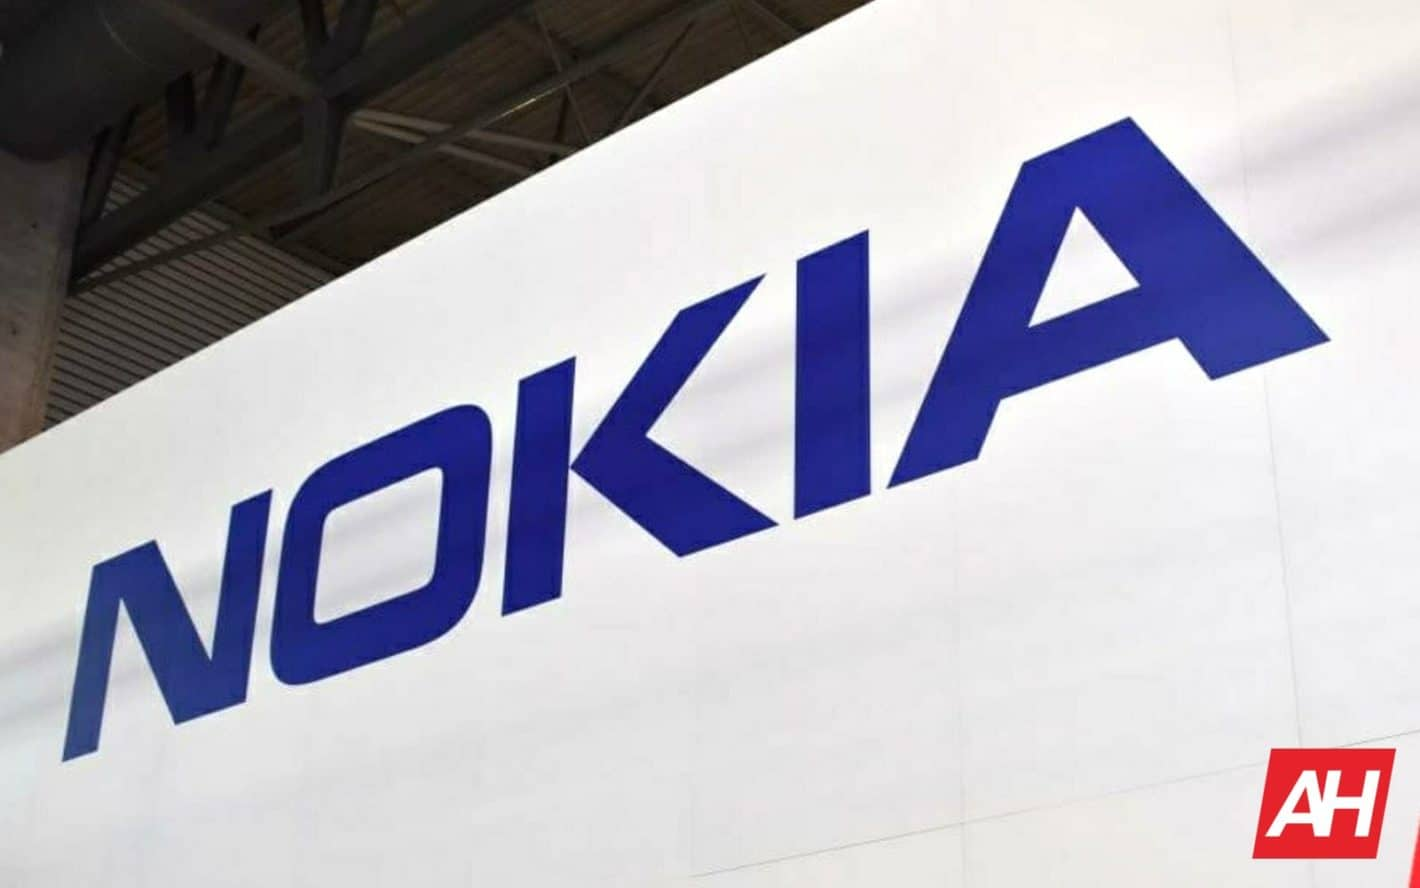 AH Nokia new logo 1 AH 2019